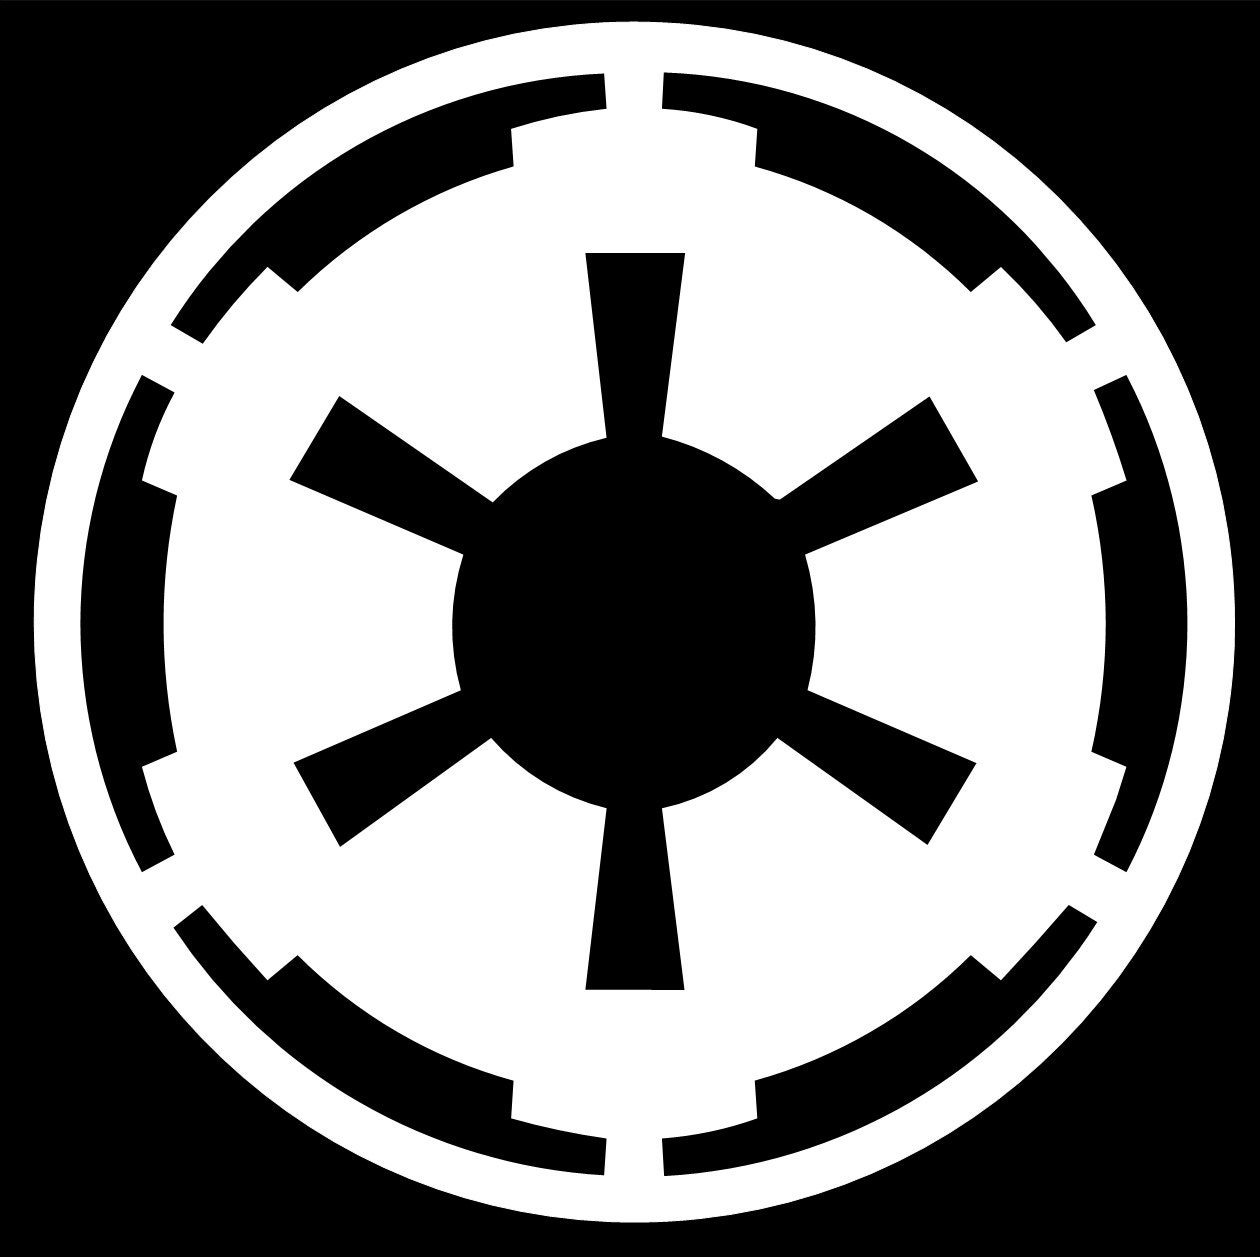 Star Wars Empire Logo These Three Films Constitute The Original Star Wars Trilogy